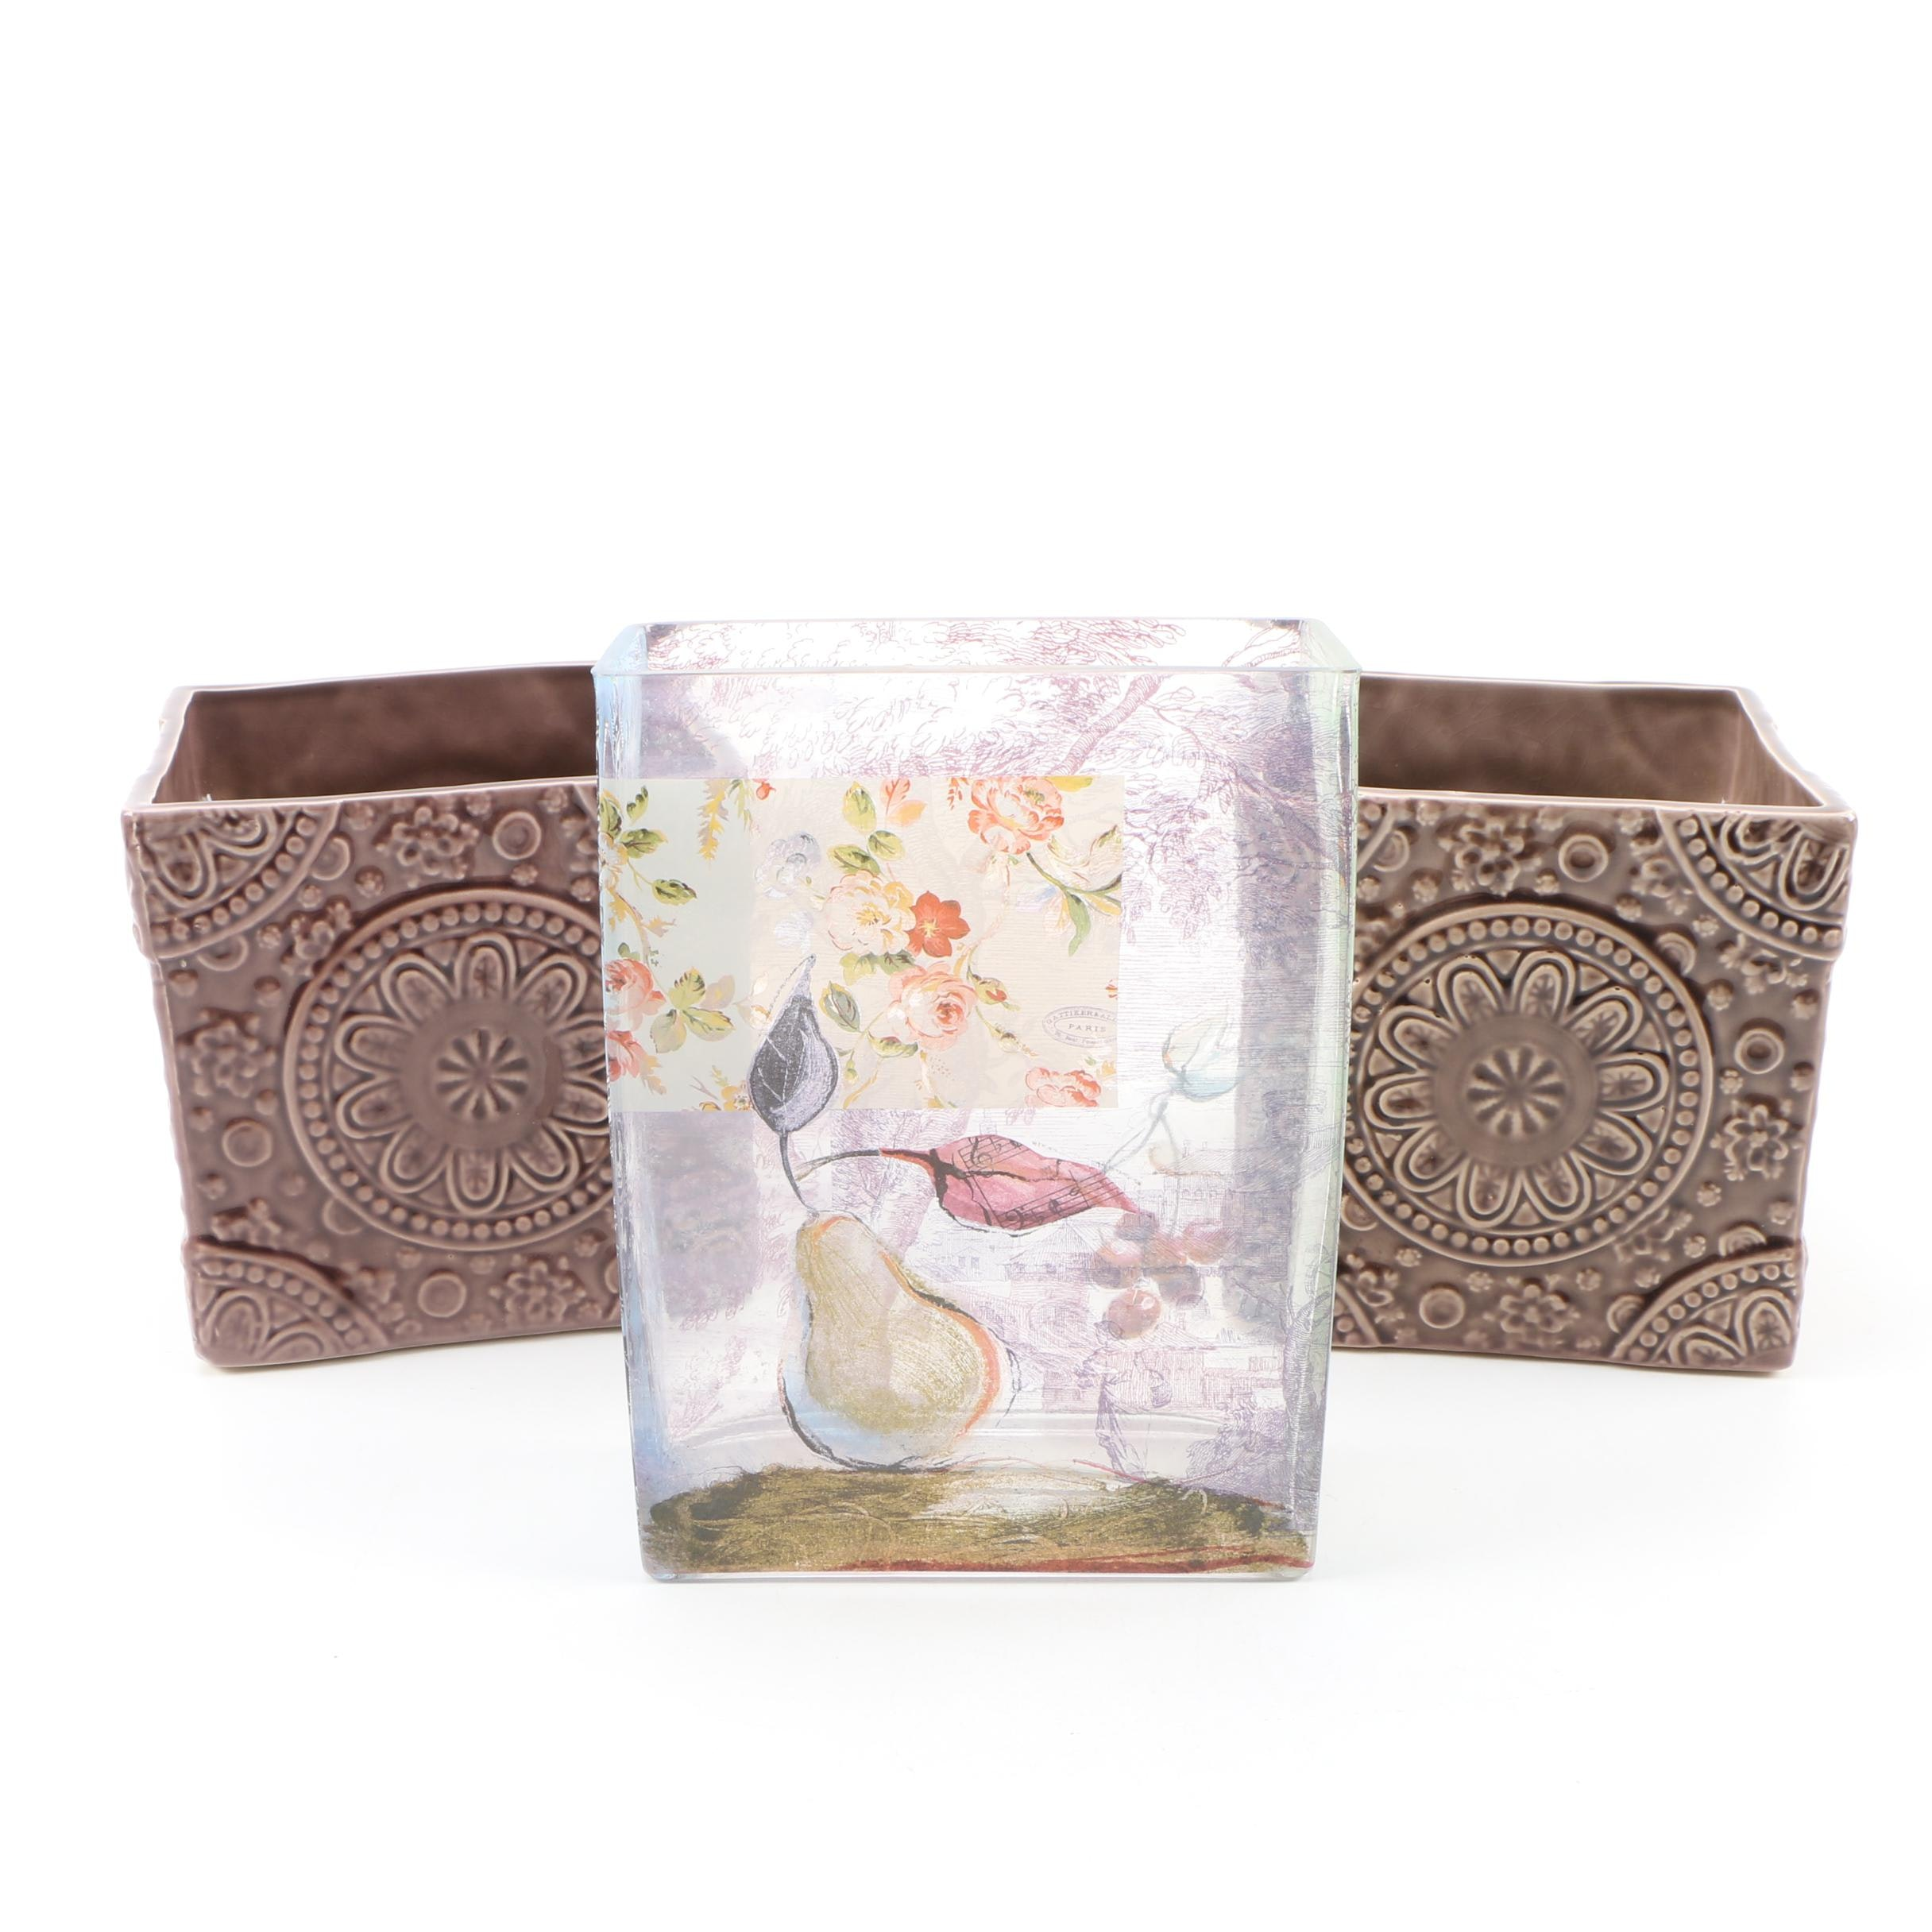 Contemporary Glass and Ceramic Vases